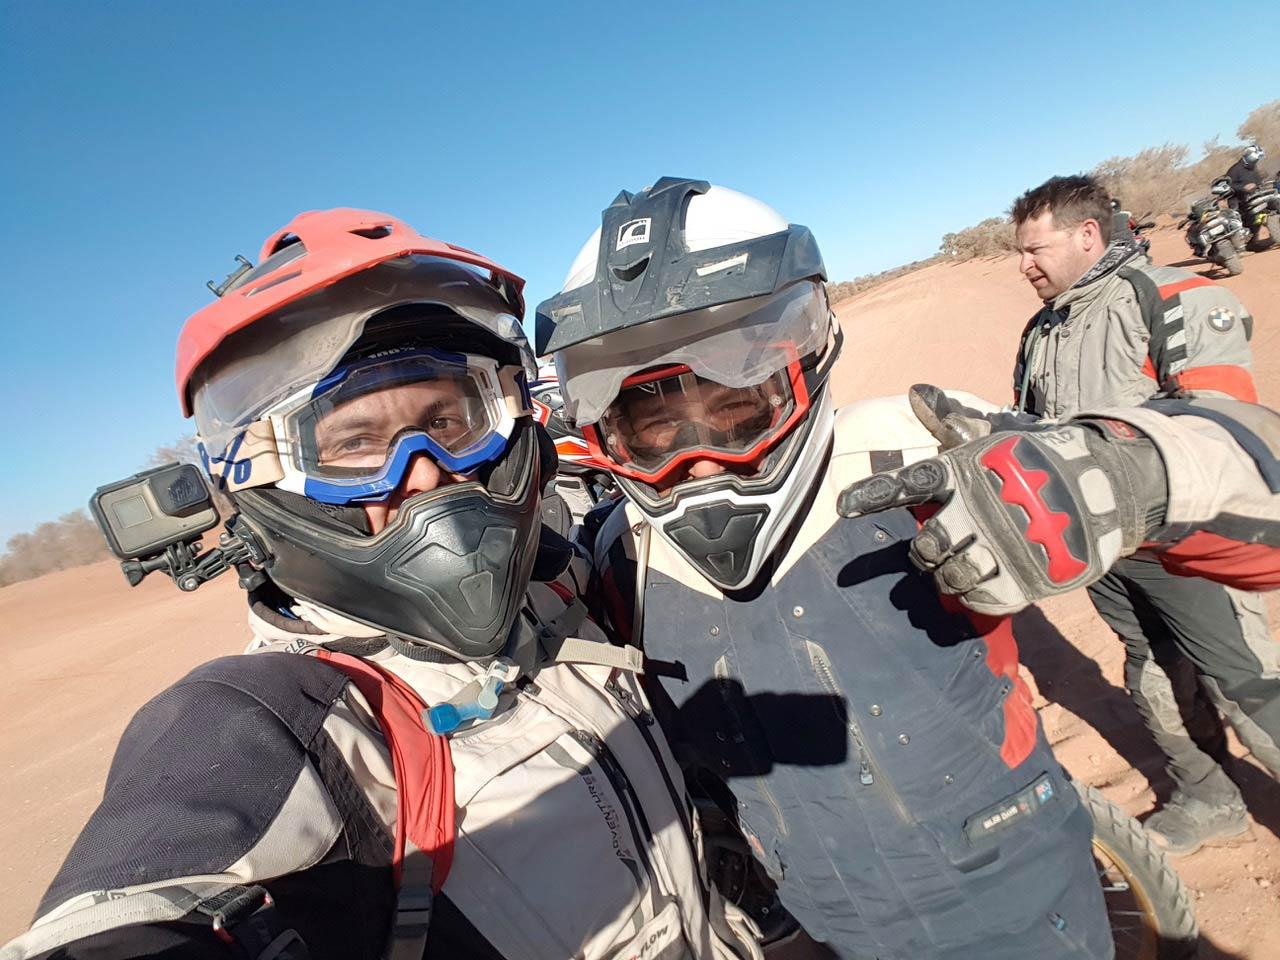 BMW GS Safari Enduro Shaun Terblanche Day riding with Miles Davis